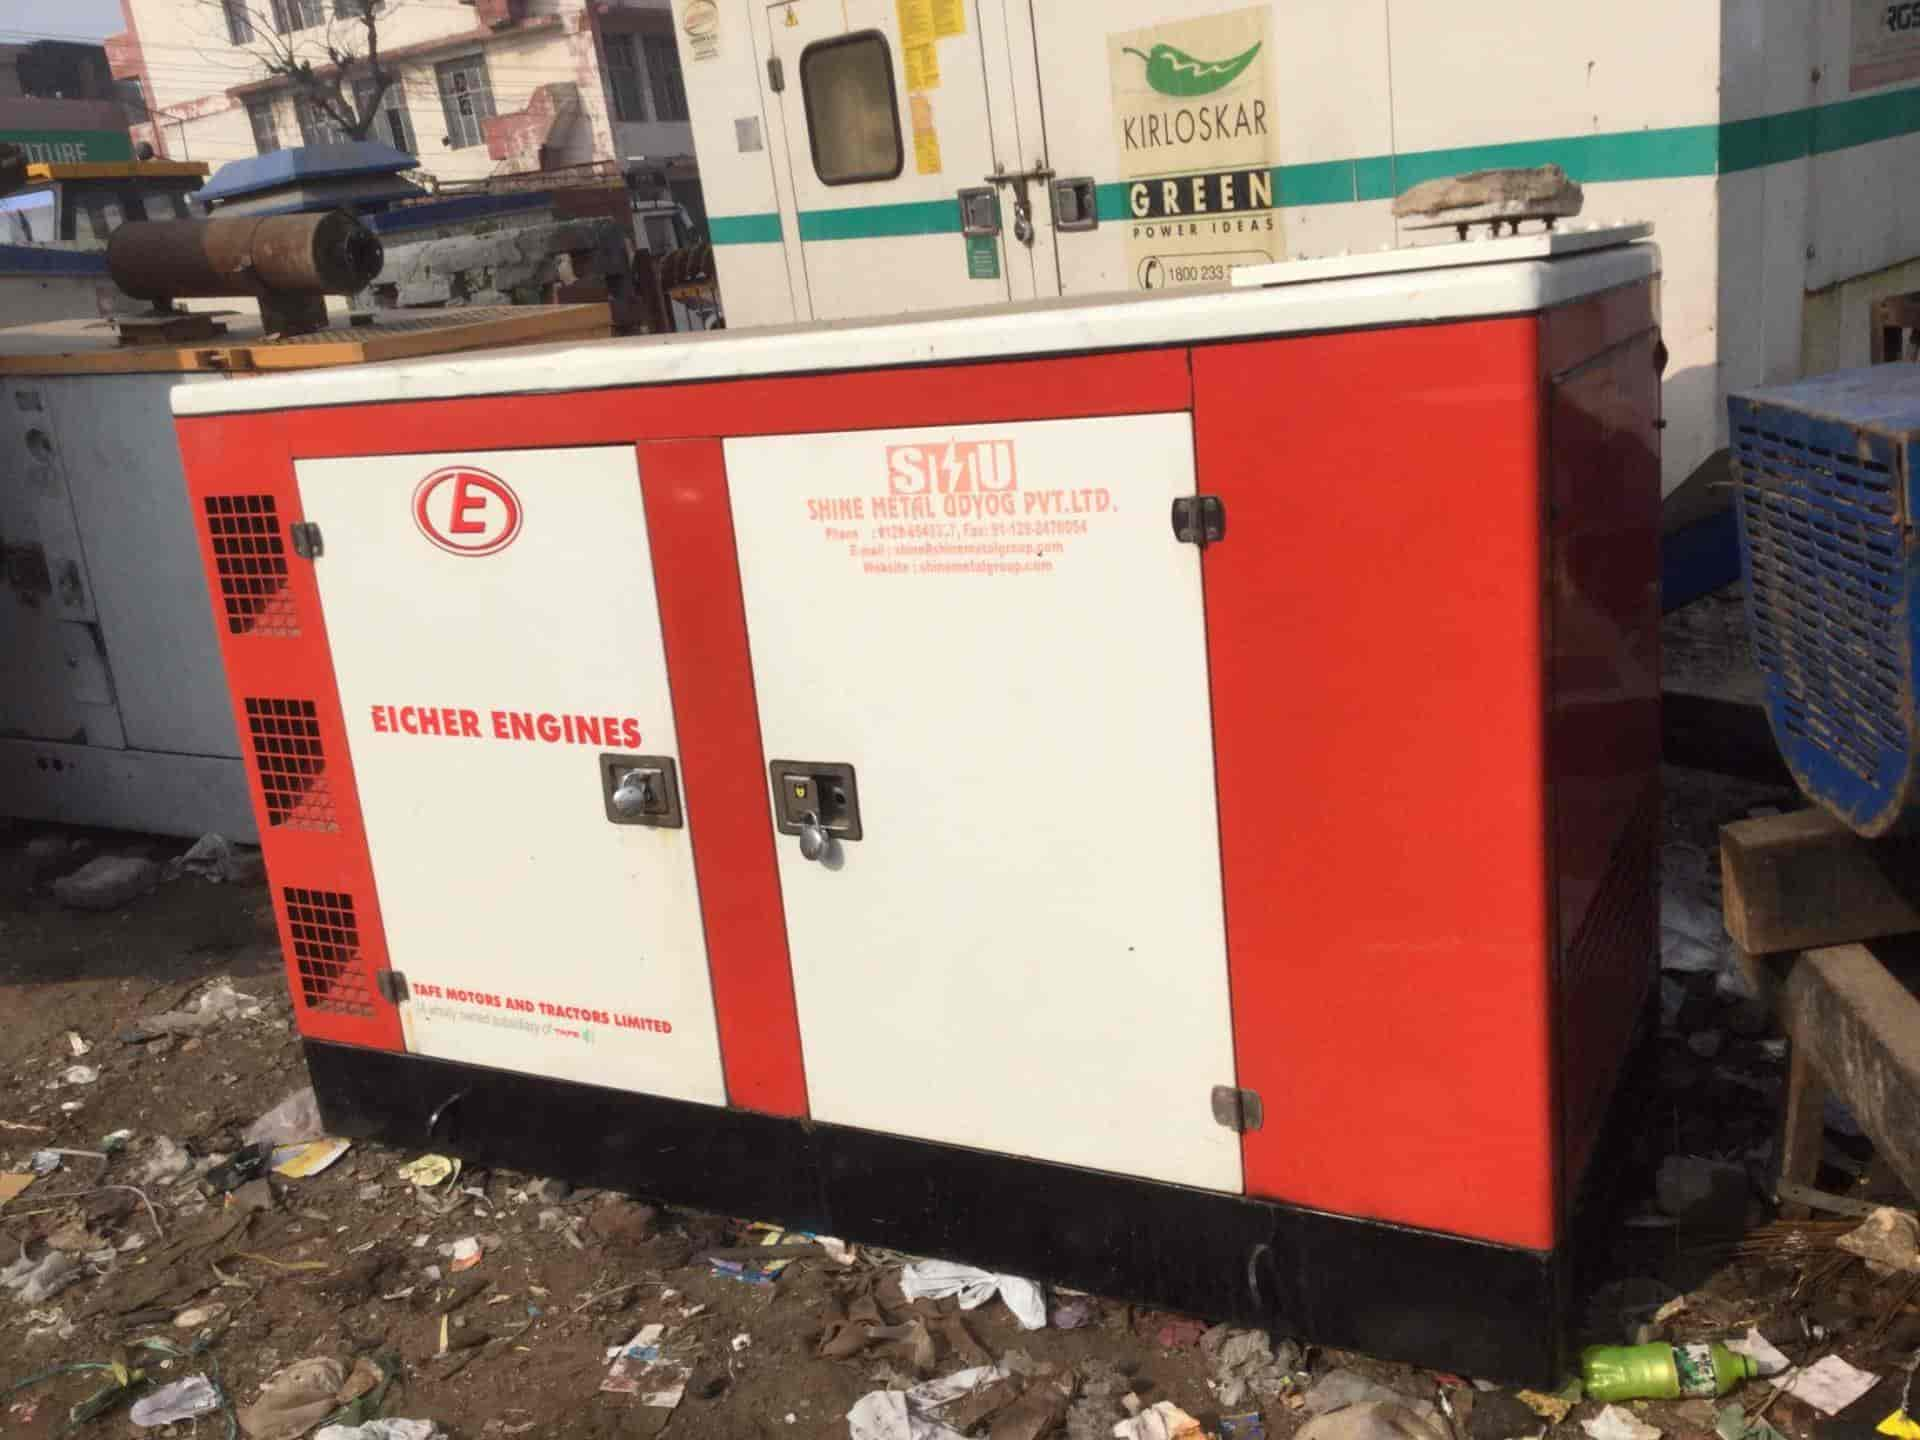 Eagle Generator Photos, Noida Sector 5, Delhi- Pictures